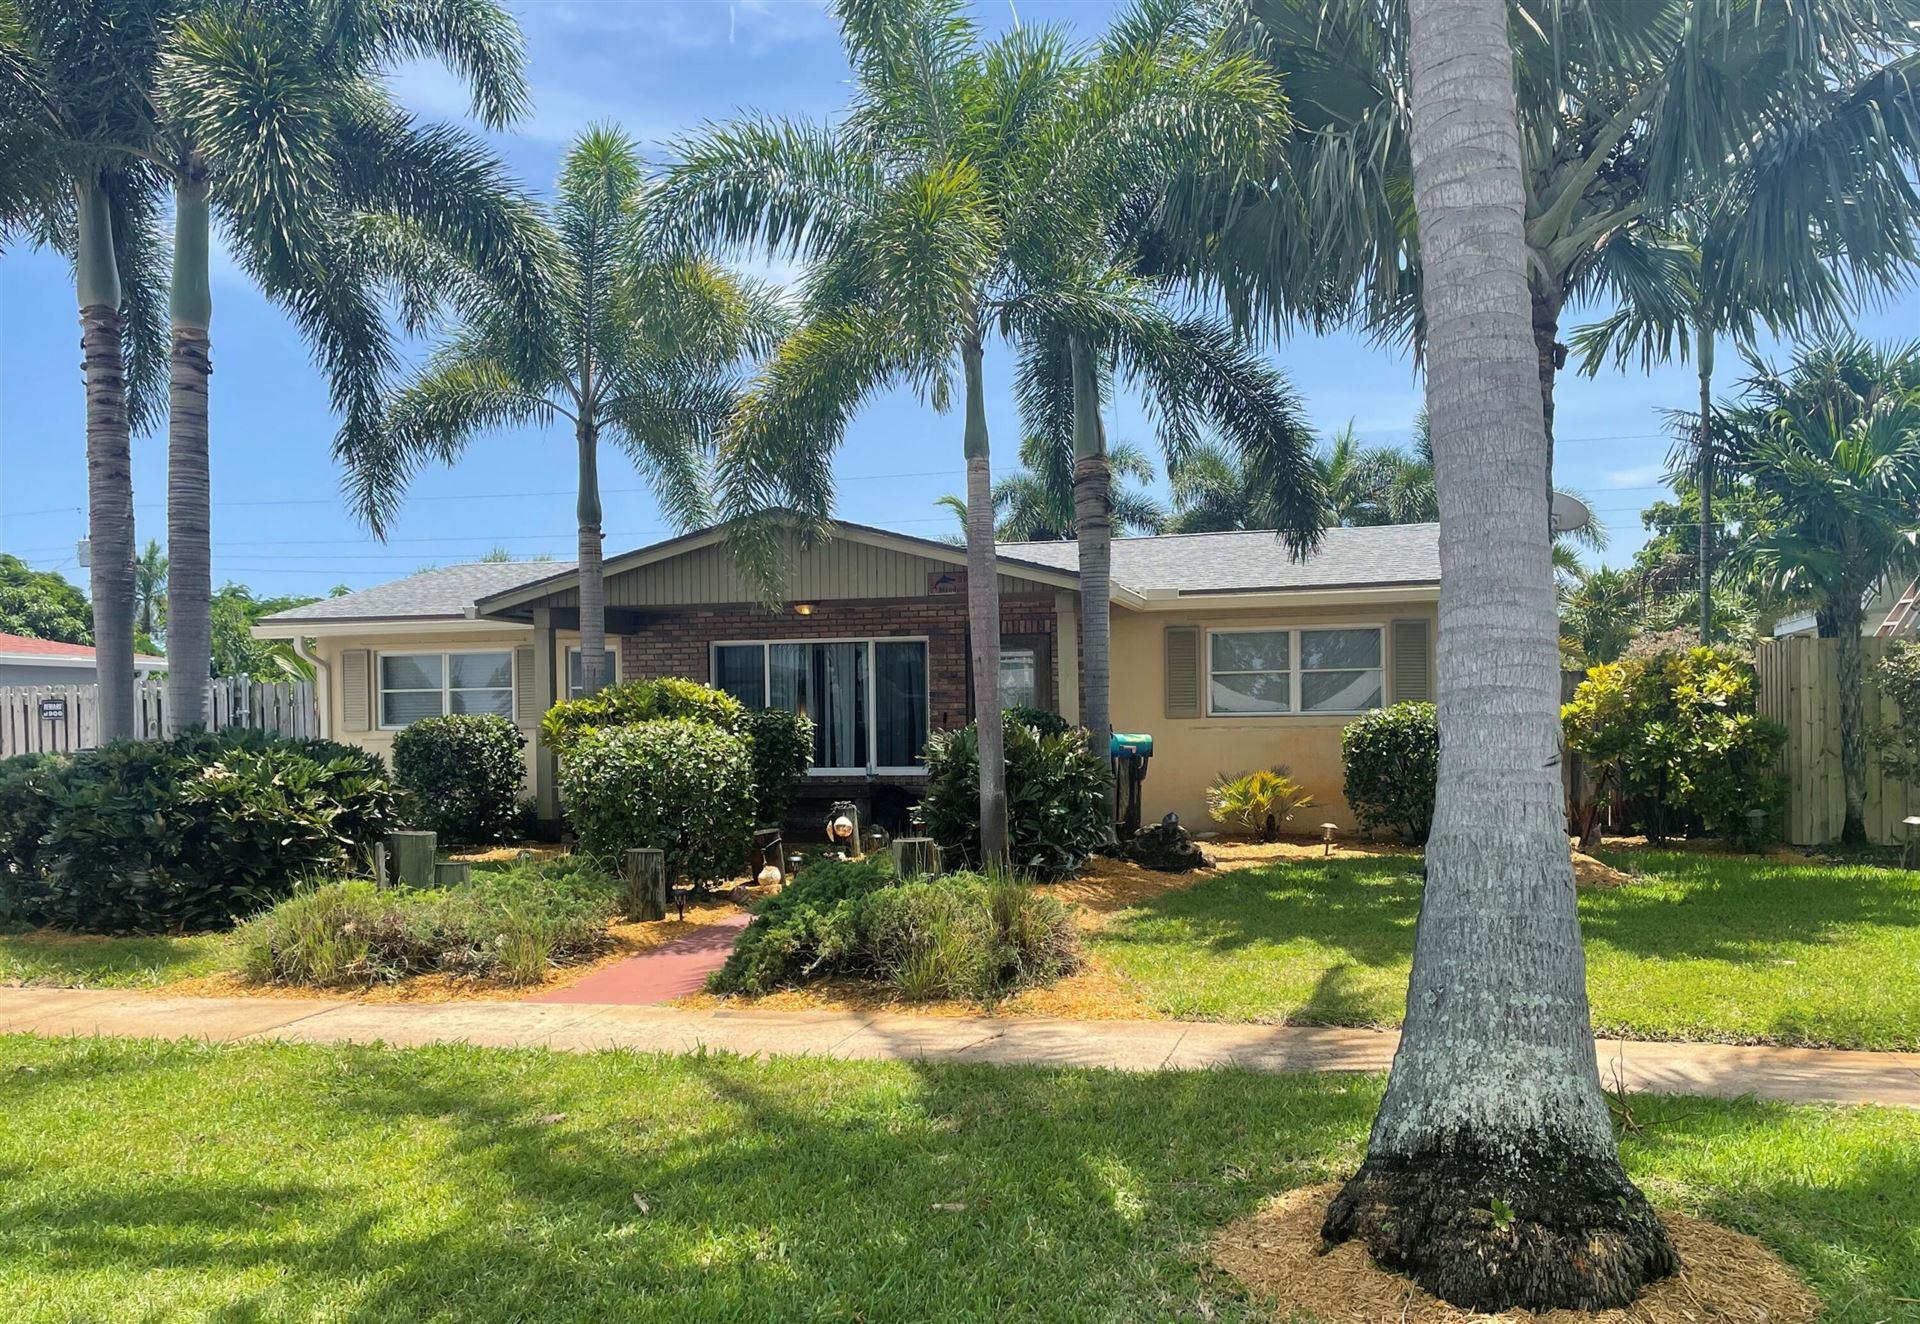 Photo of 2608 Meadow Road, West Palm Beach, FL 33406 (MLS # RX-10731980)